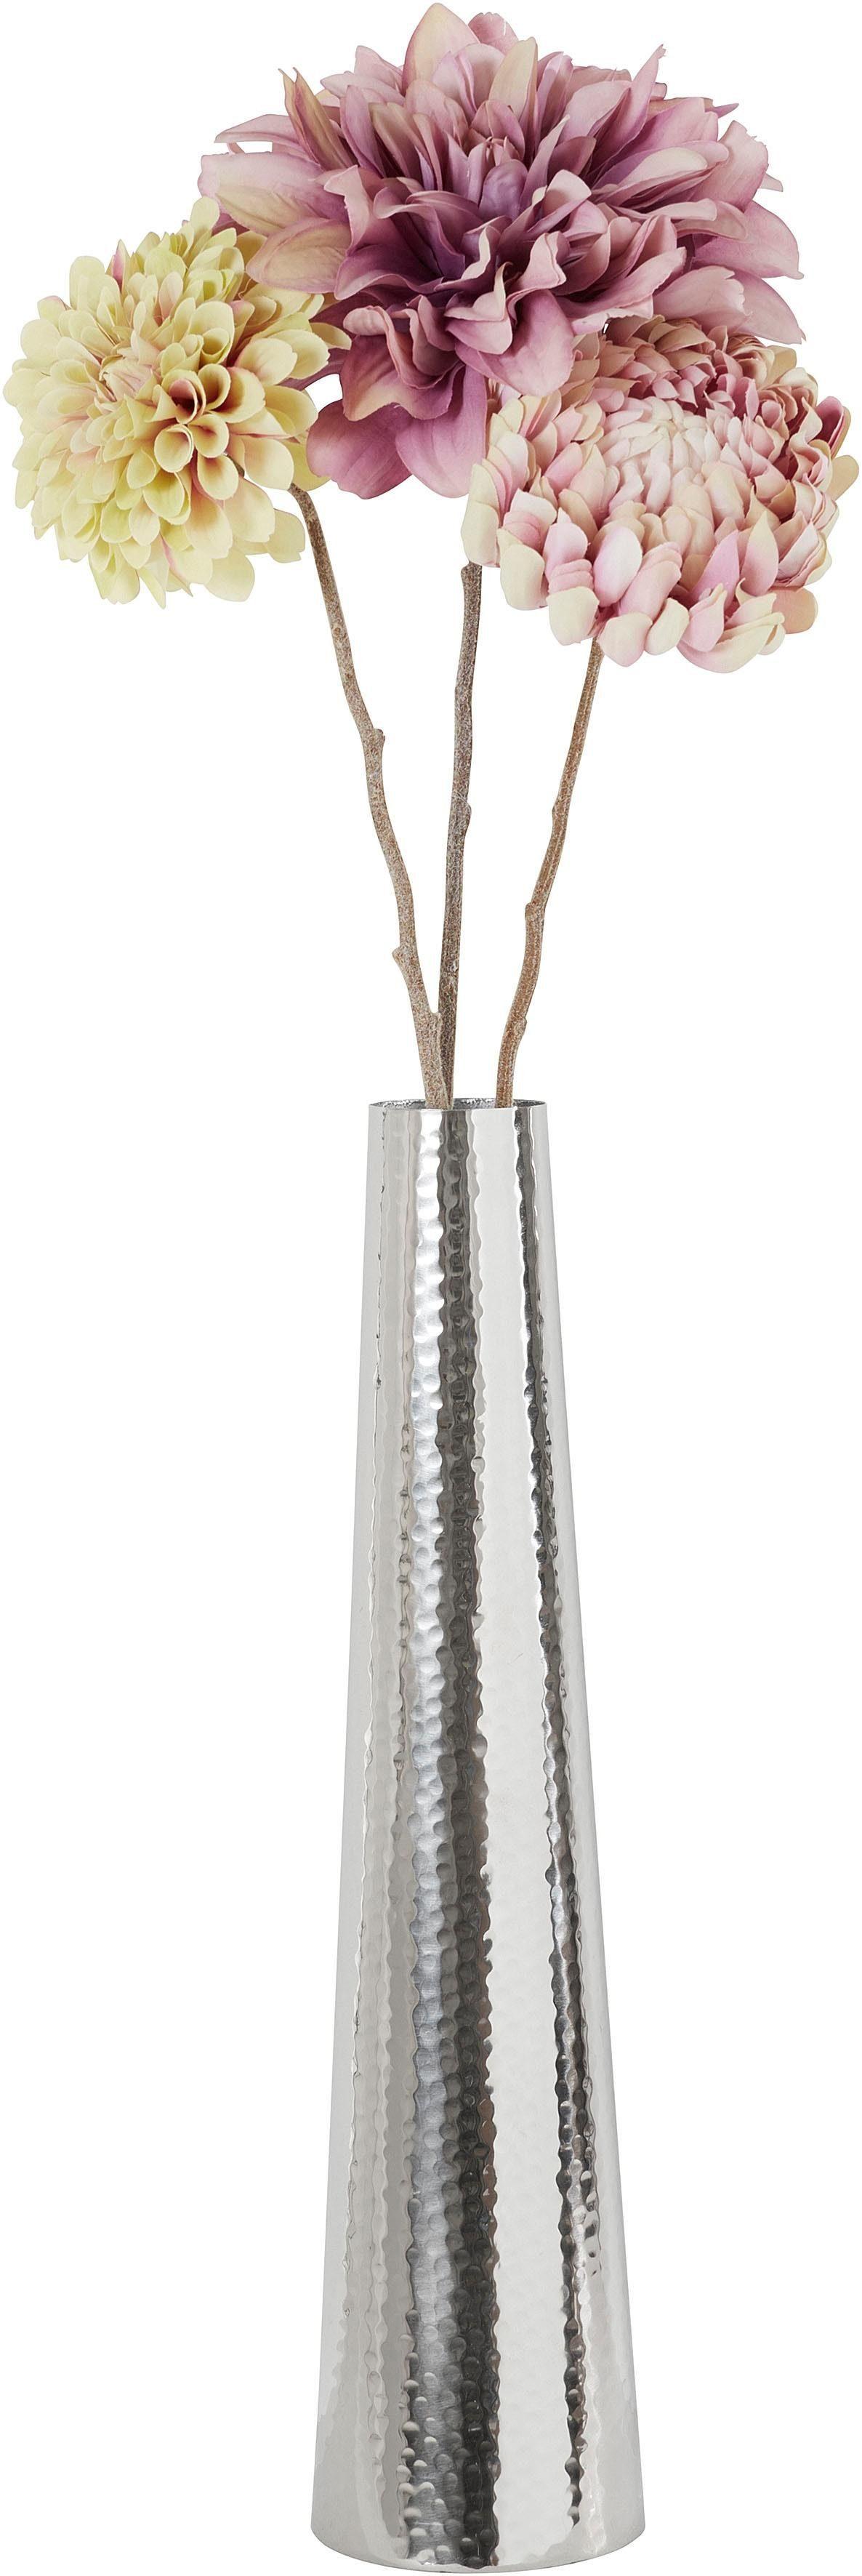 Edelstahl Vase